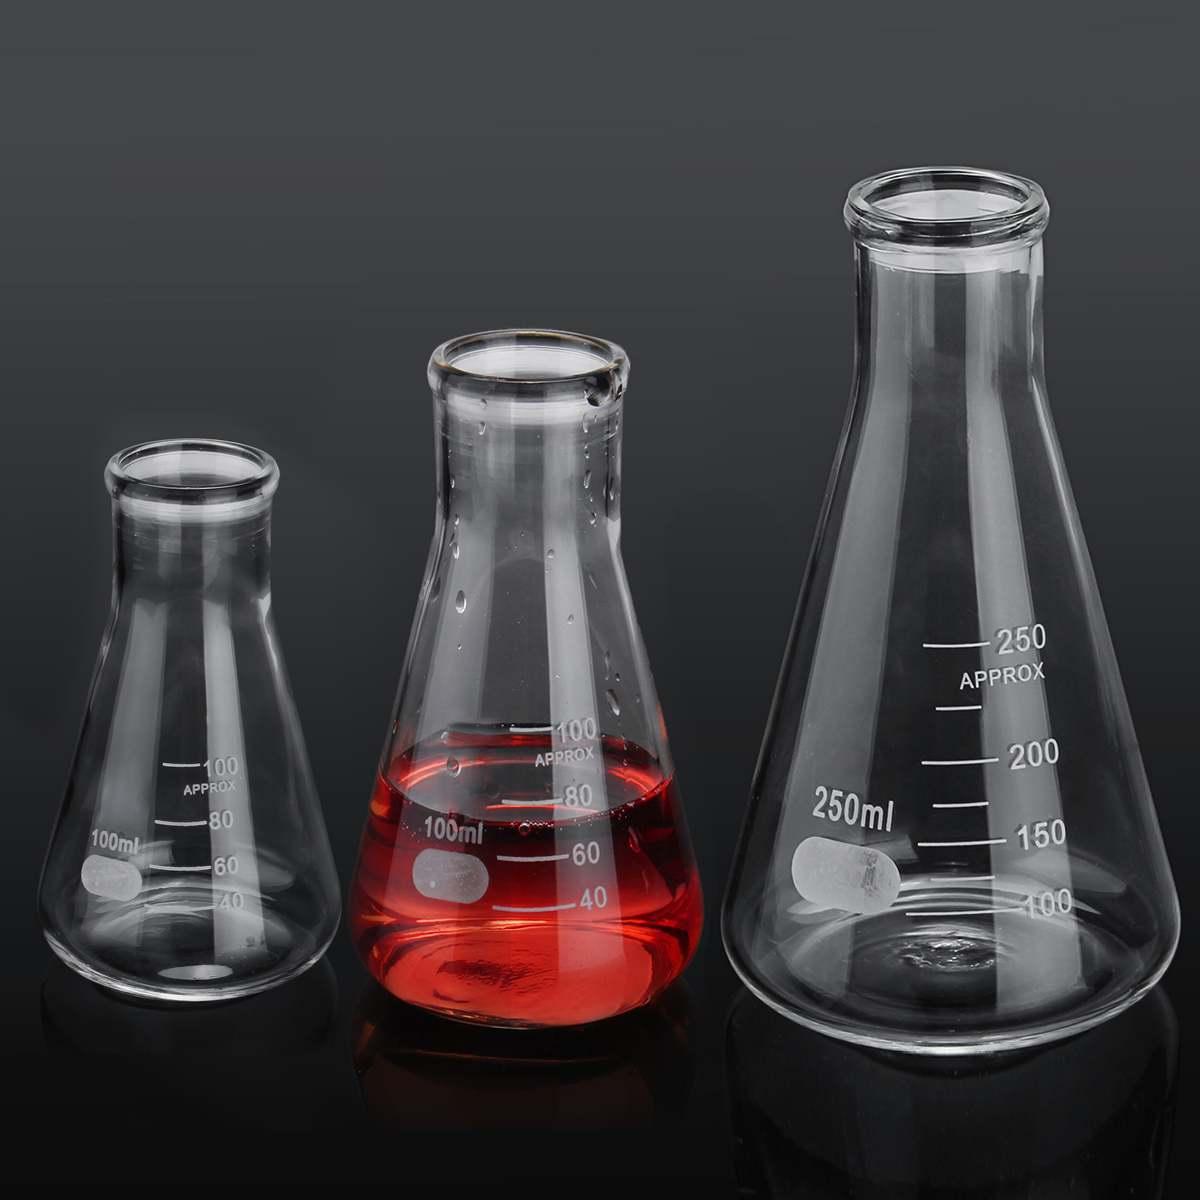 1pcs Erlenmeyer Flask Borosilicate Glass Narrow Neck Conical Triangle Flask Laboratory Chemistry Equipment 50ml 100ml 250ml